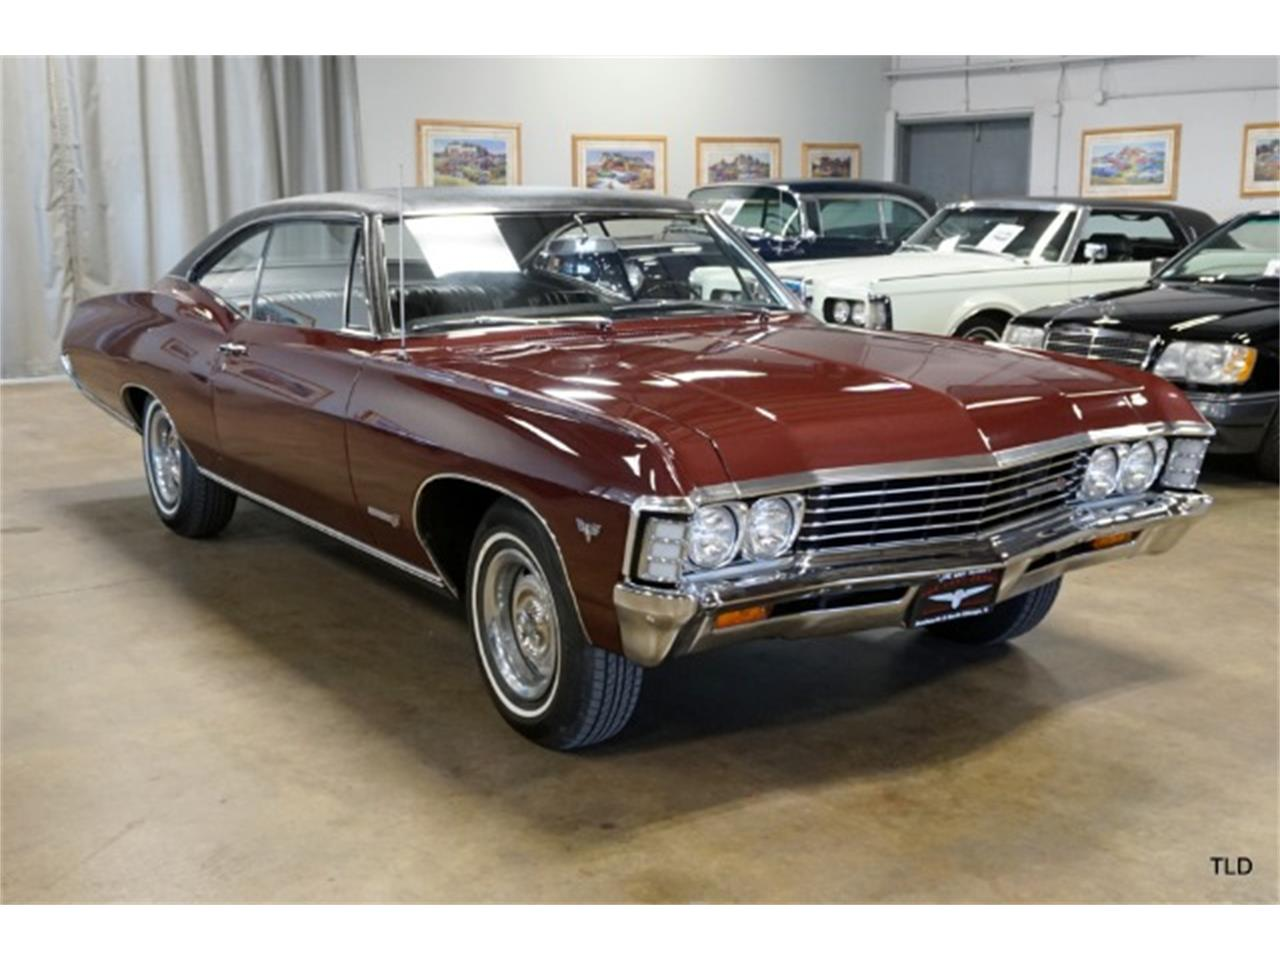 1967 Chevrolet Impala For Sale In Chicago Il Classiccarsbay Com